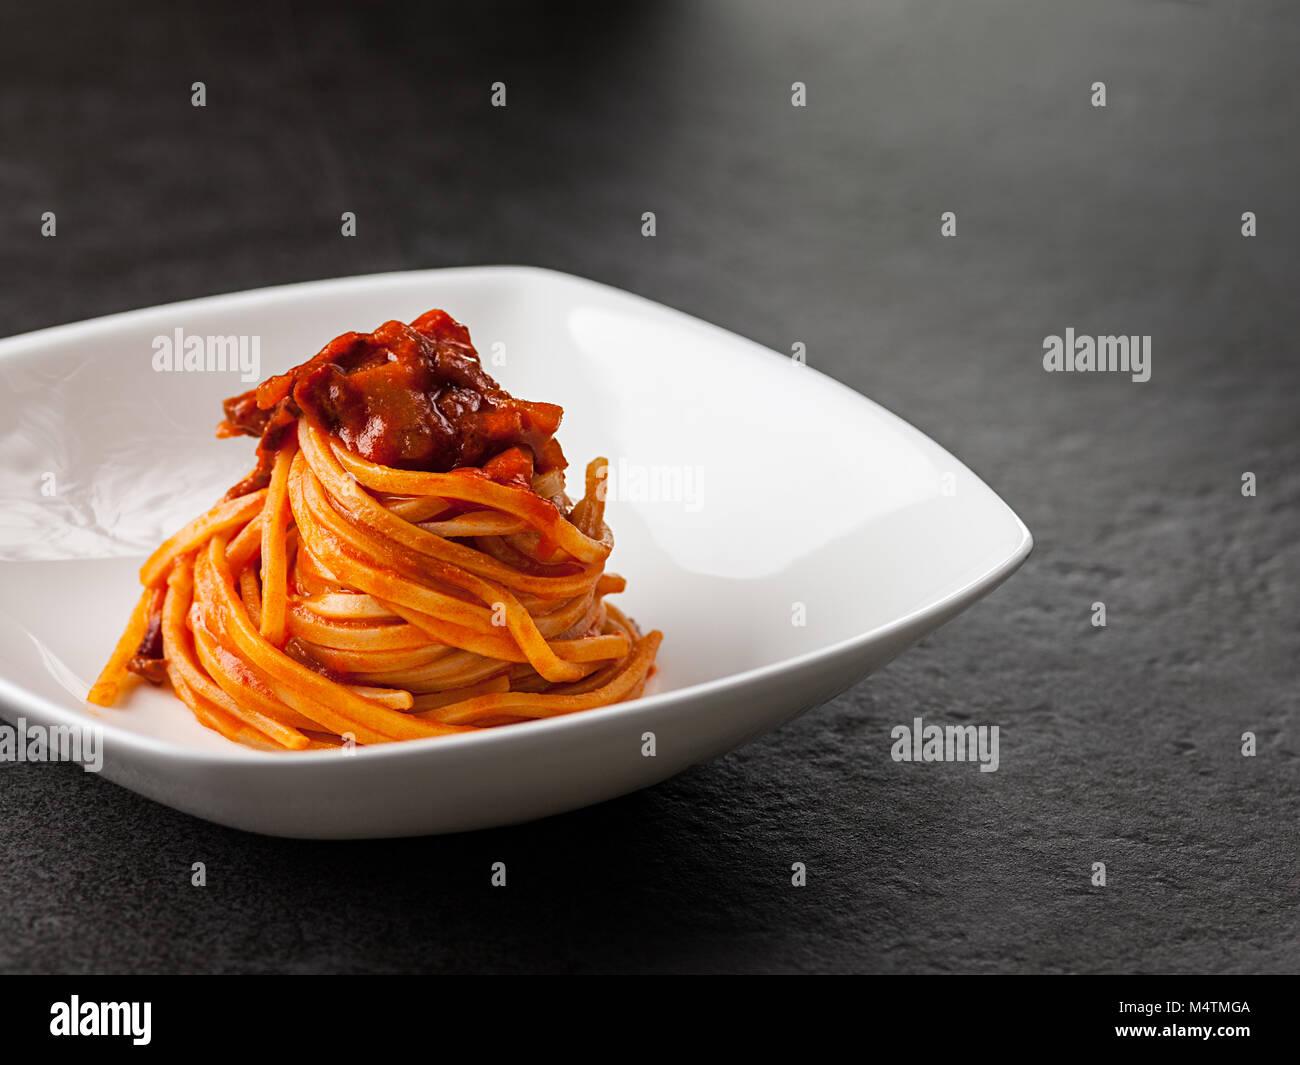 Traditional Amatriciana Pasta - Stock Image